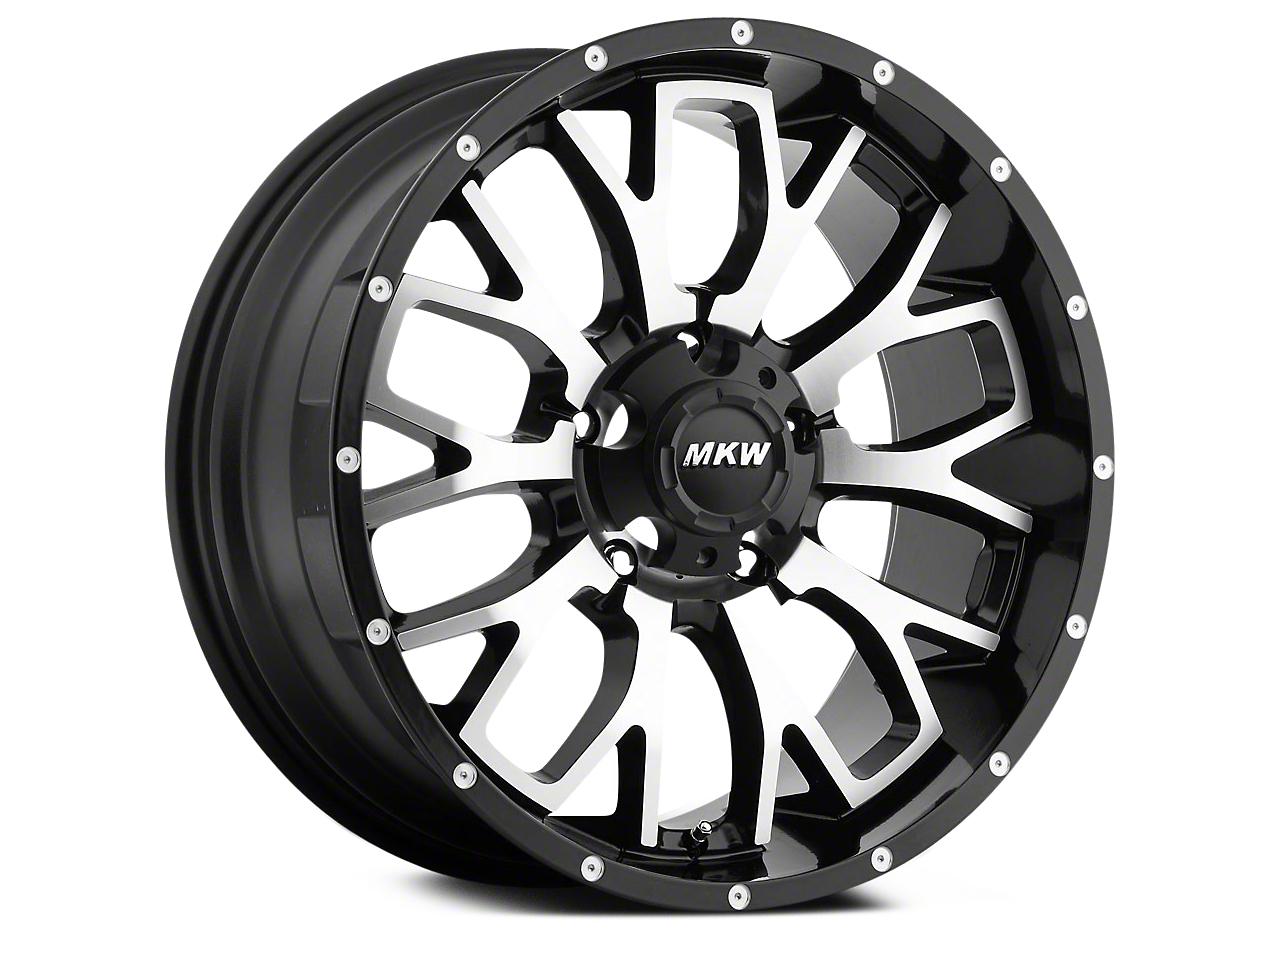 MKW Offroad M95 Satin Black Machined 6-Lug Wheel - 18x9 (04-17 All)